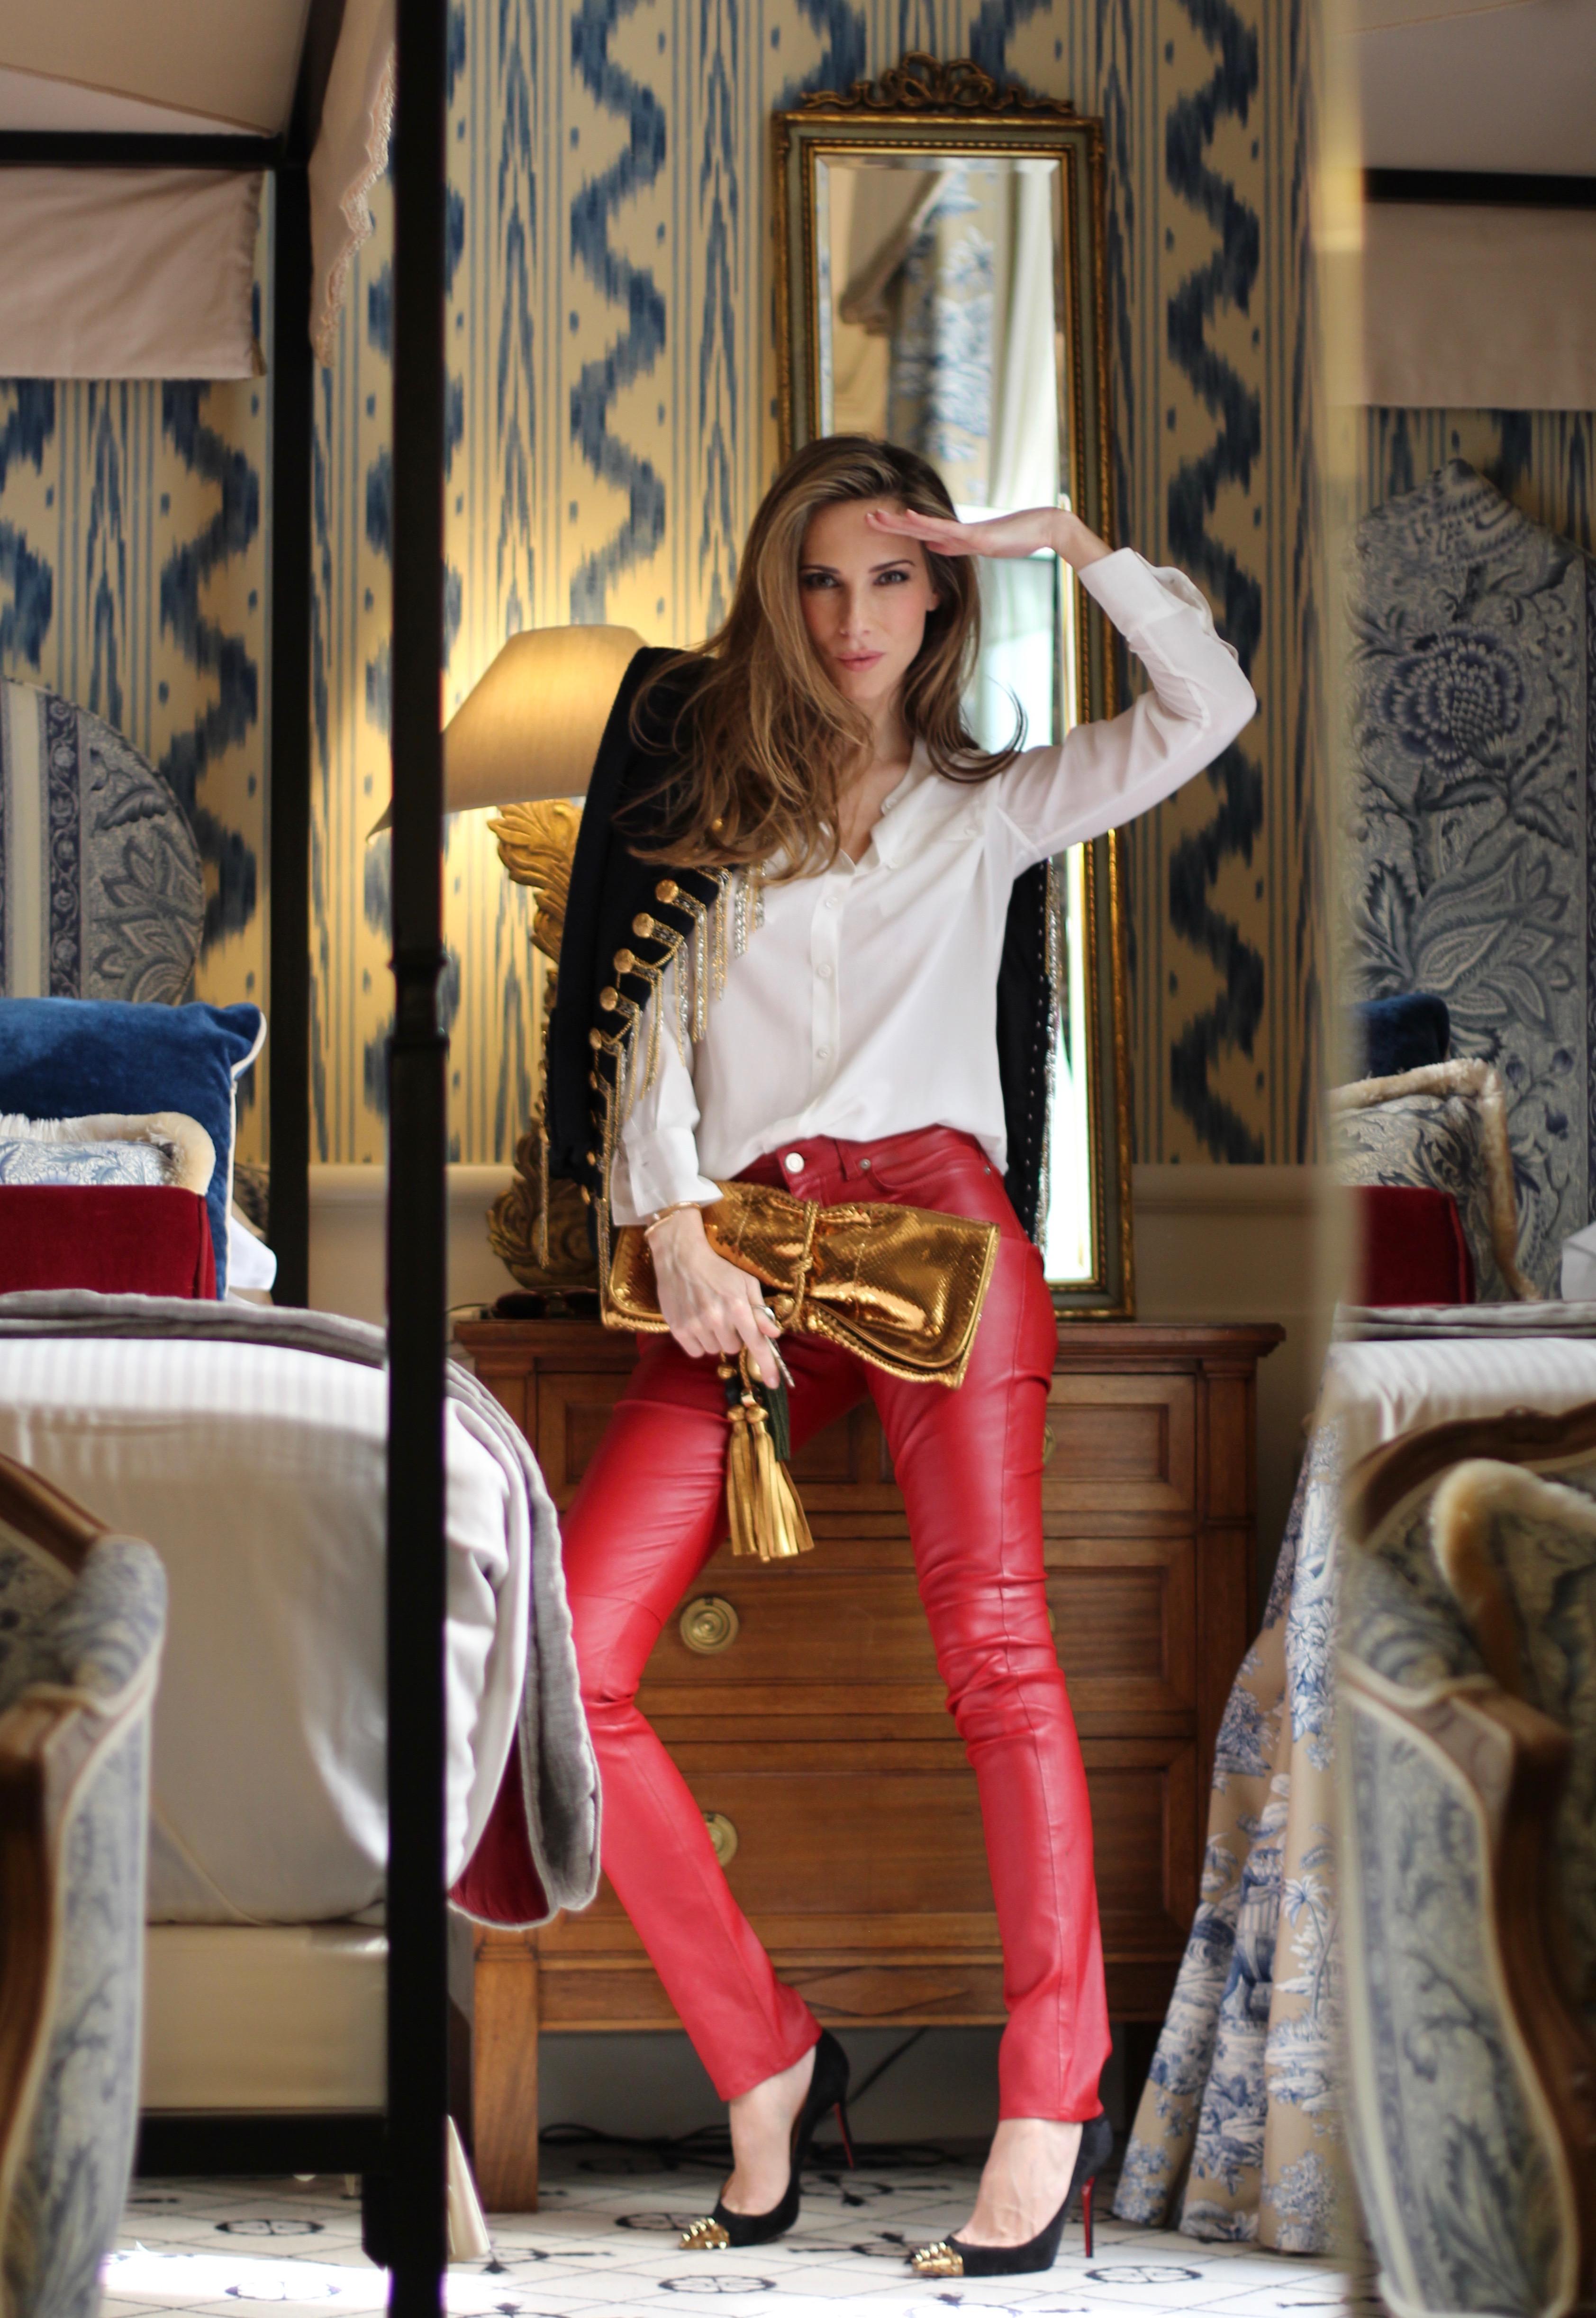 ... Gucci · Alexandra Lapp wearing Balmain, 0039-Italy, Saint Laurent, Christian Louboutin, ...